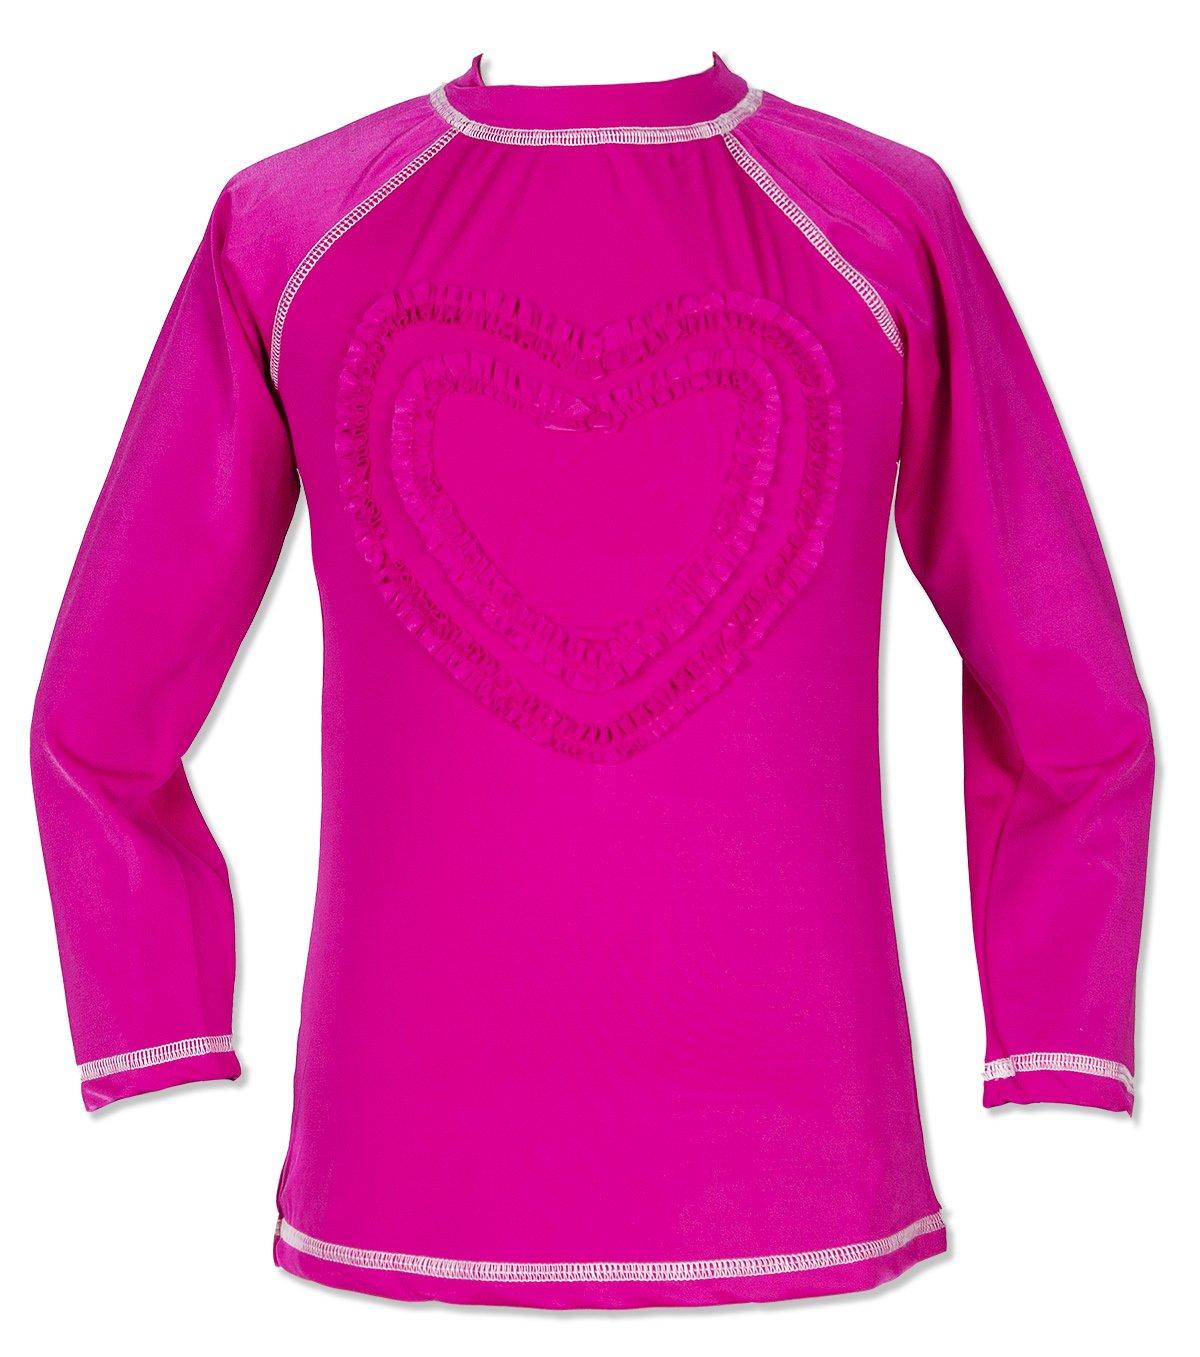 Teen Big Girls' Ruffled Valentine Long-Sleeve Rash Guard Swim Shirts UPF 50+ Sun Protective Aloha Pink 8-9